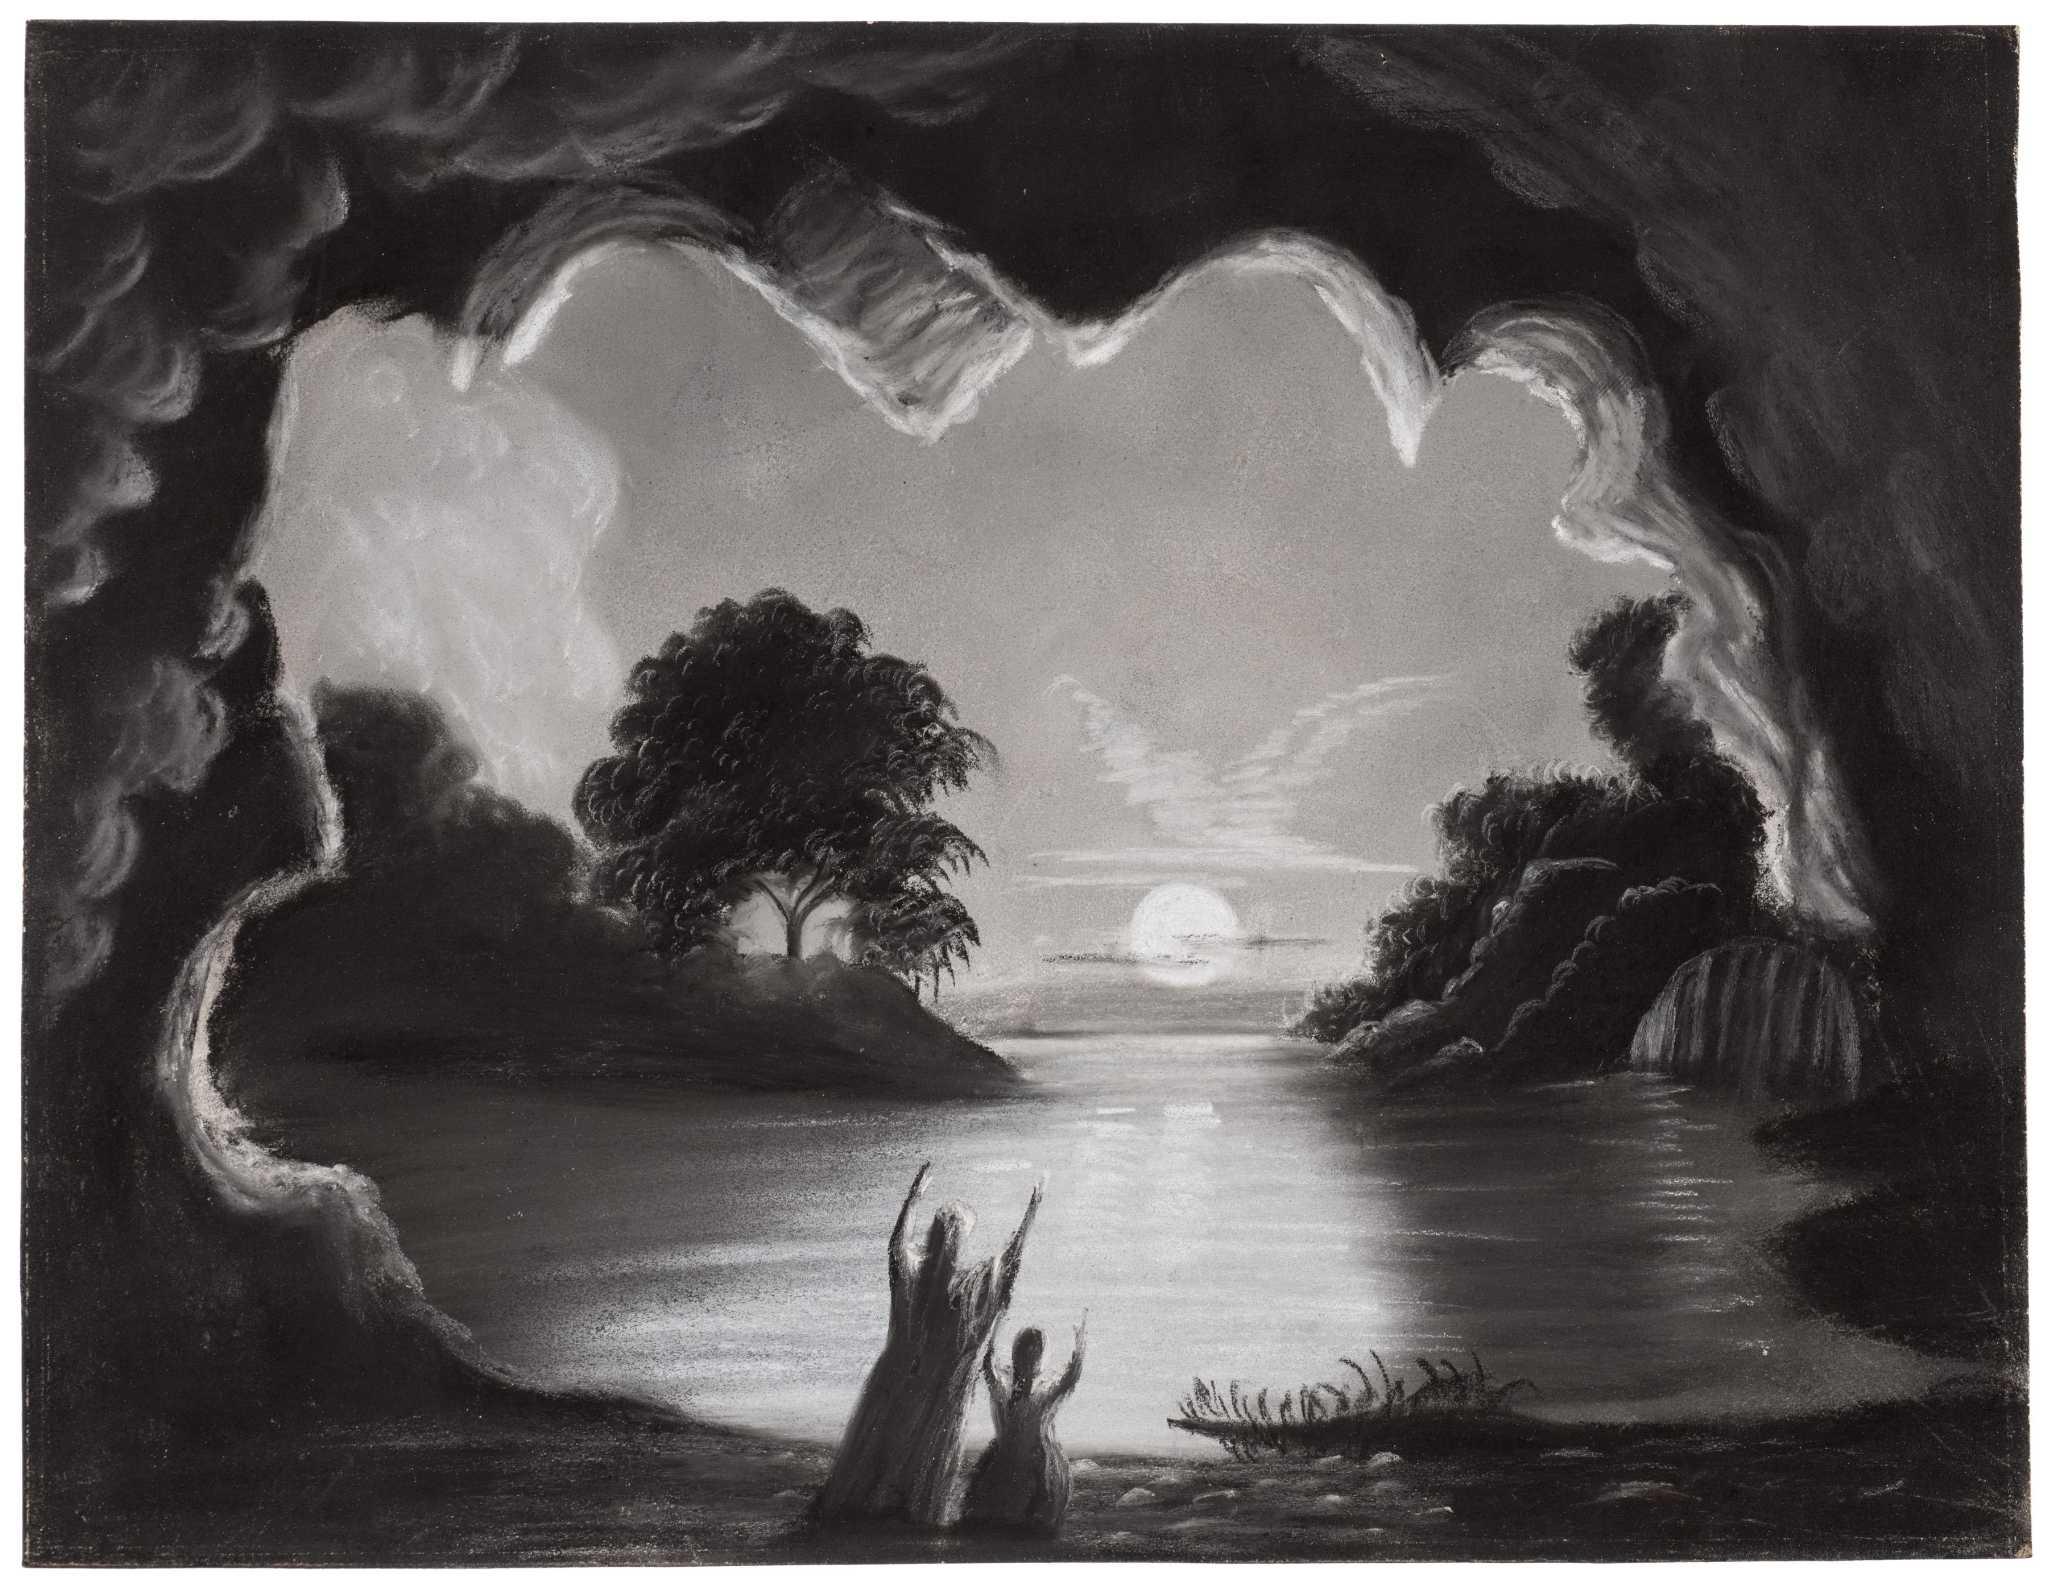 a peek inside the art collected by eccentric artist edward